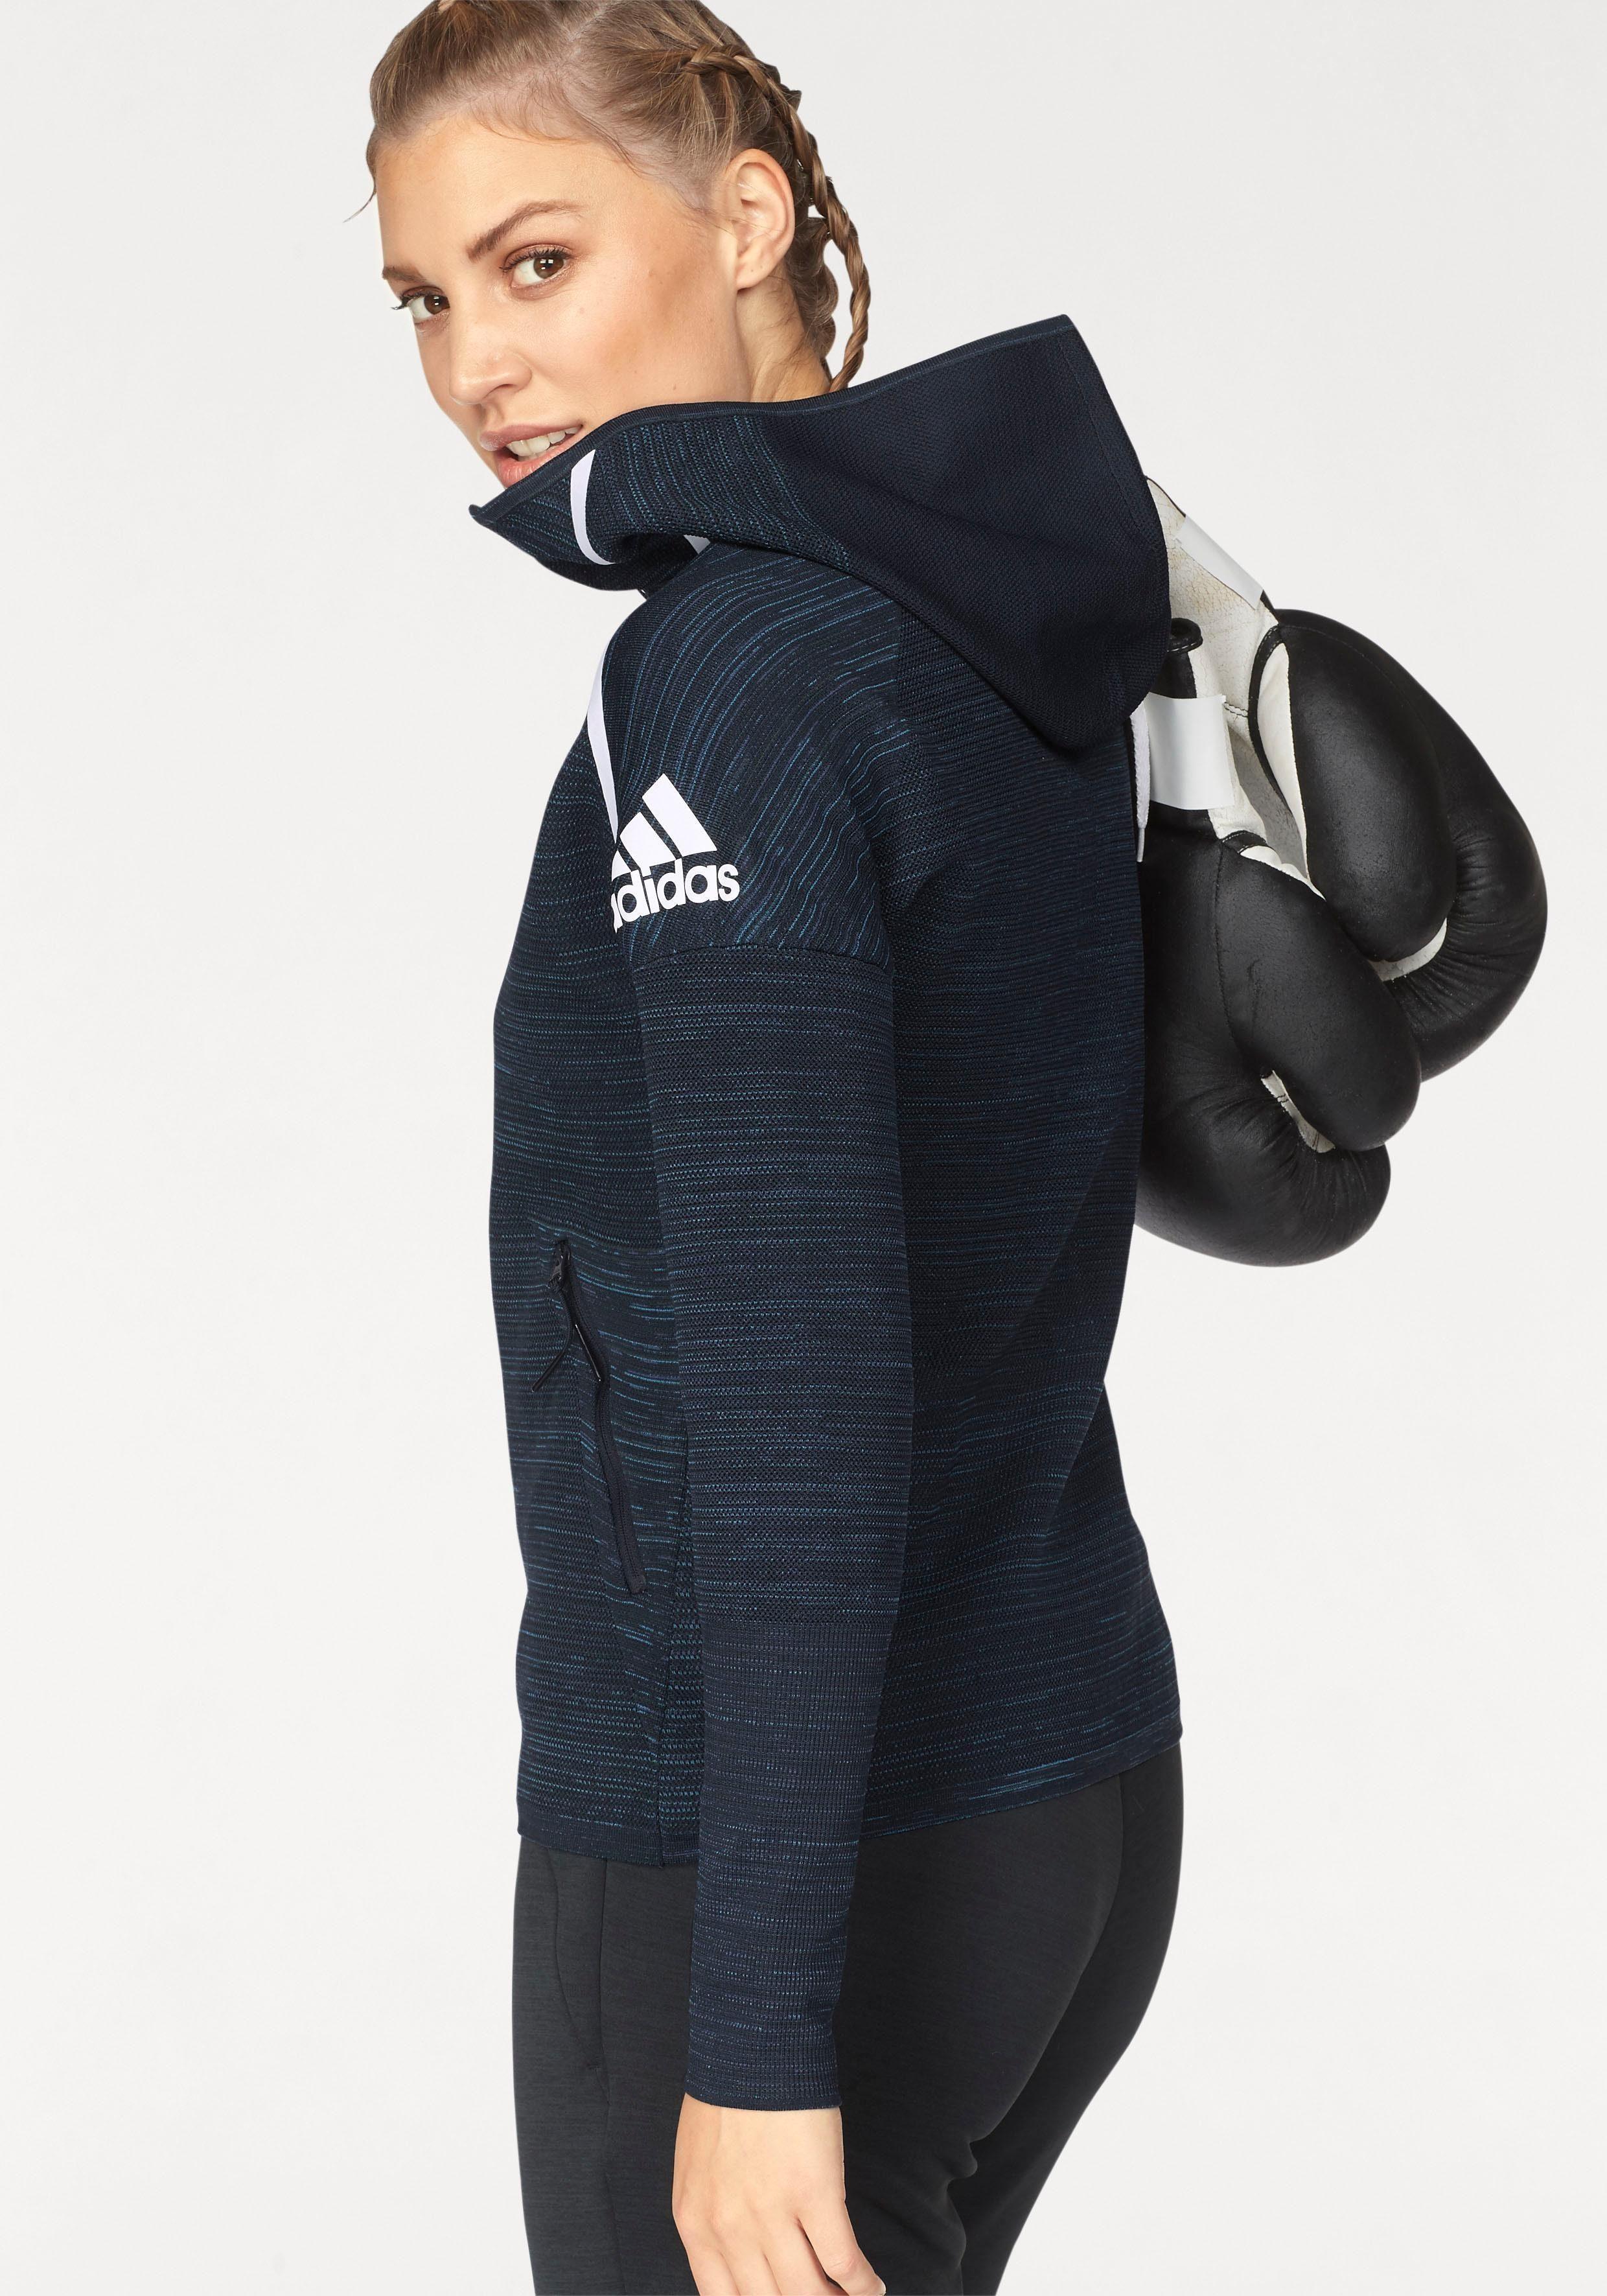 OTTO | SALE Damen adidas Performance Trainingsjacke WOMEN